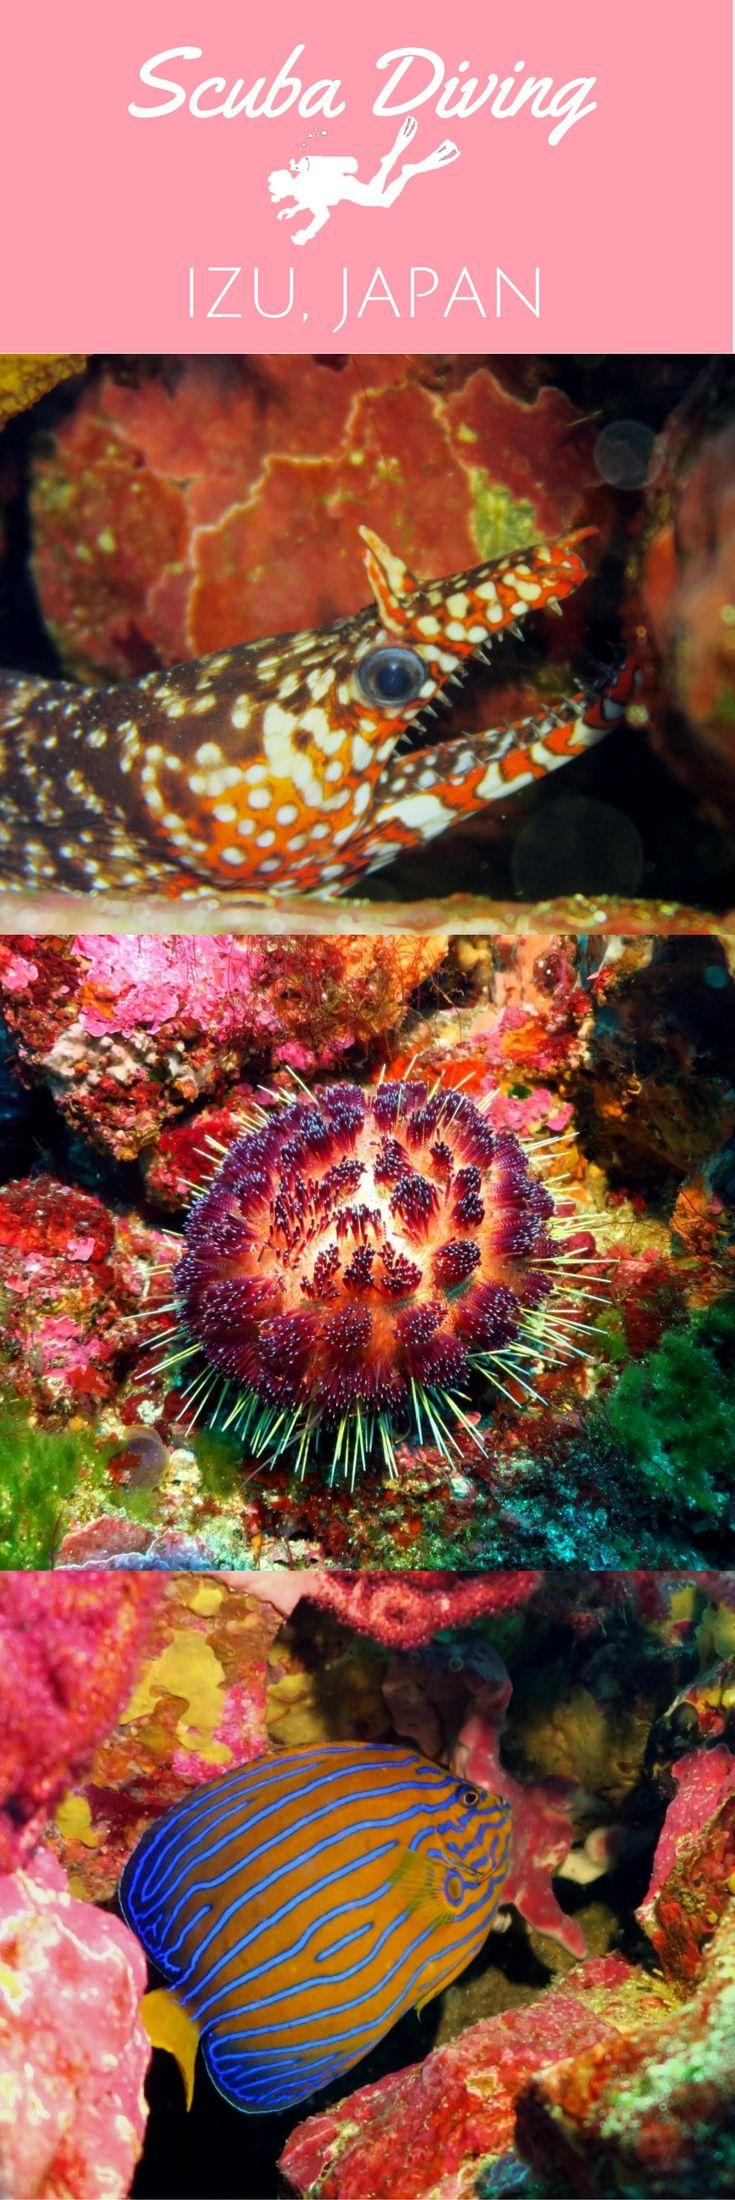 Scuba diving in Izu Ocean Park near Tokyo, Japan - World Adventure Divers - read more on https://worldadventuredivers.com/2017/02/22/scuba-diving-tokyo-to-izu-japan/